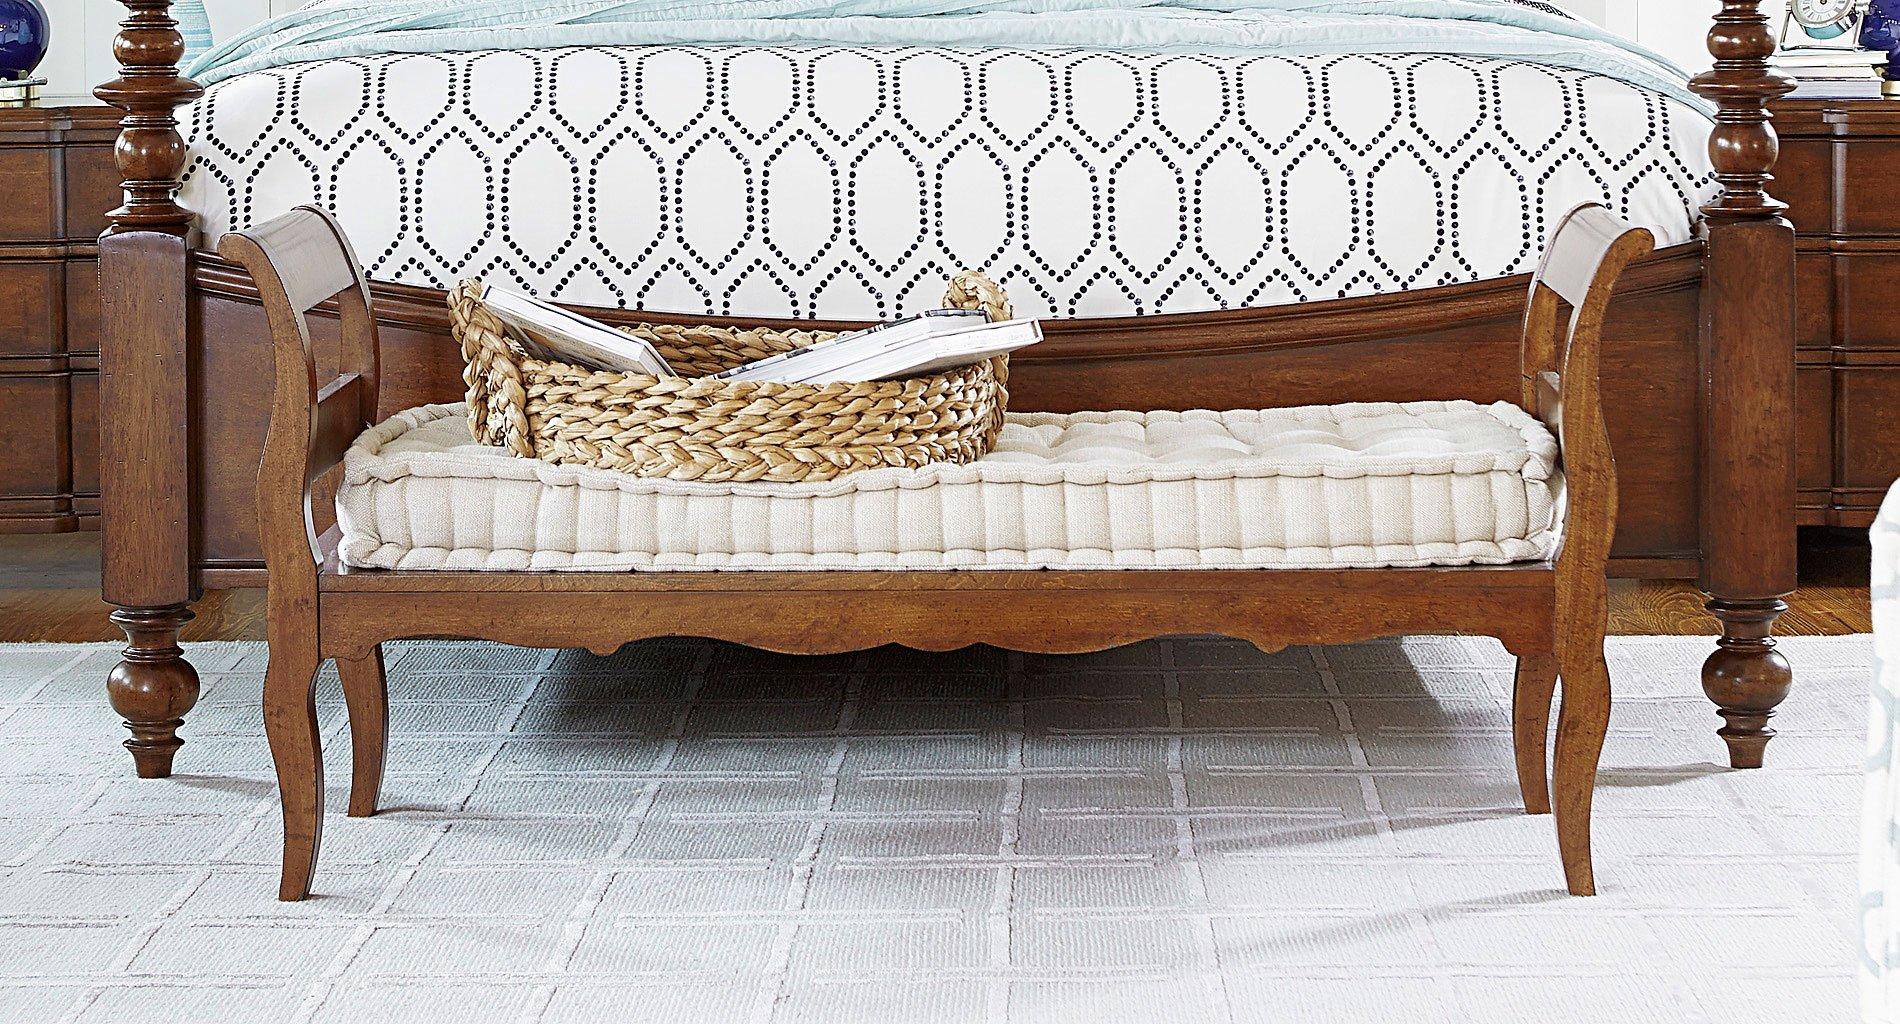 Dogwood Bed End Bench Low Tide Paula Deen Home